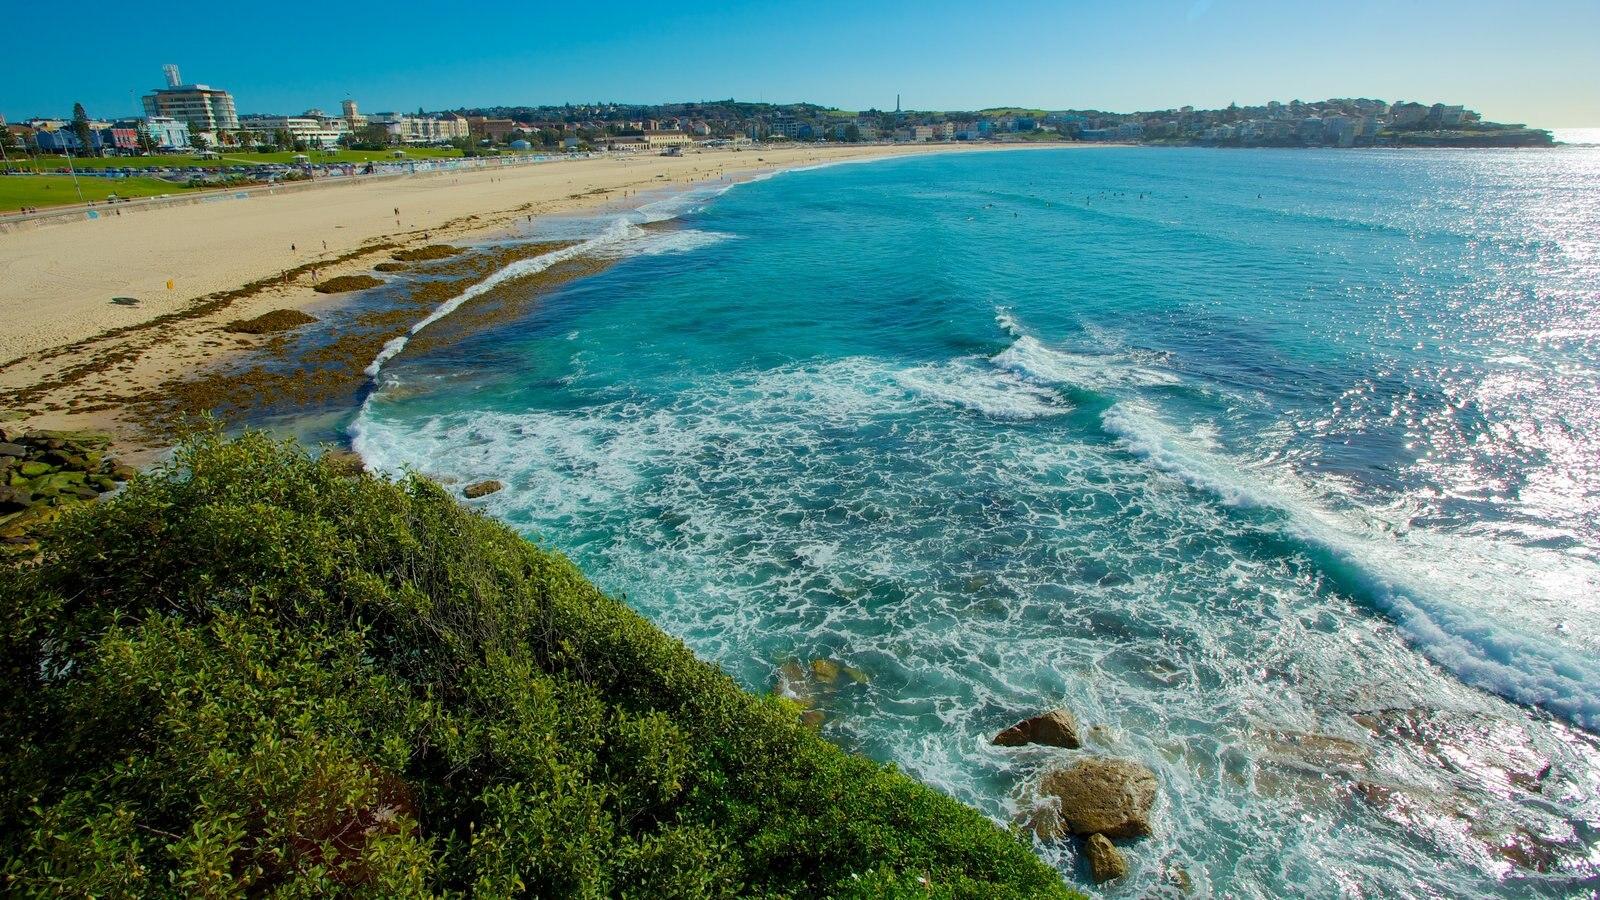 Sydney showing a sandy beach, landscape views and general coastal views